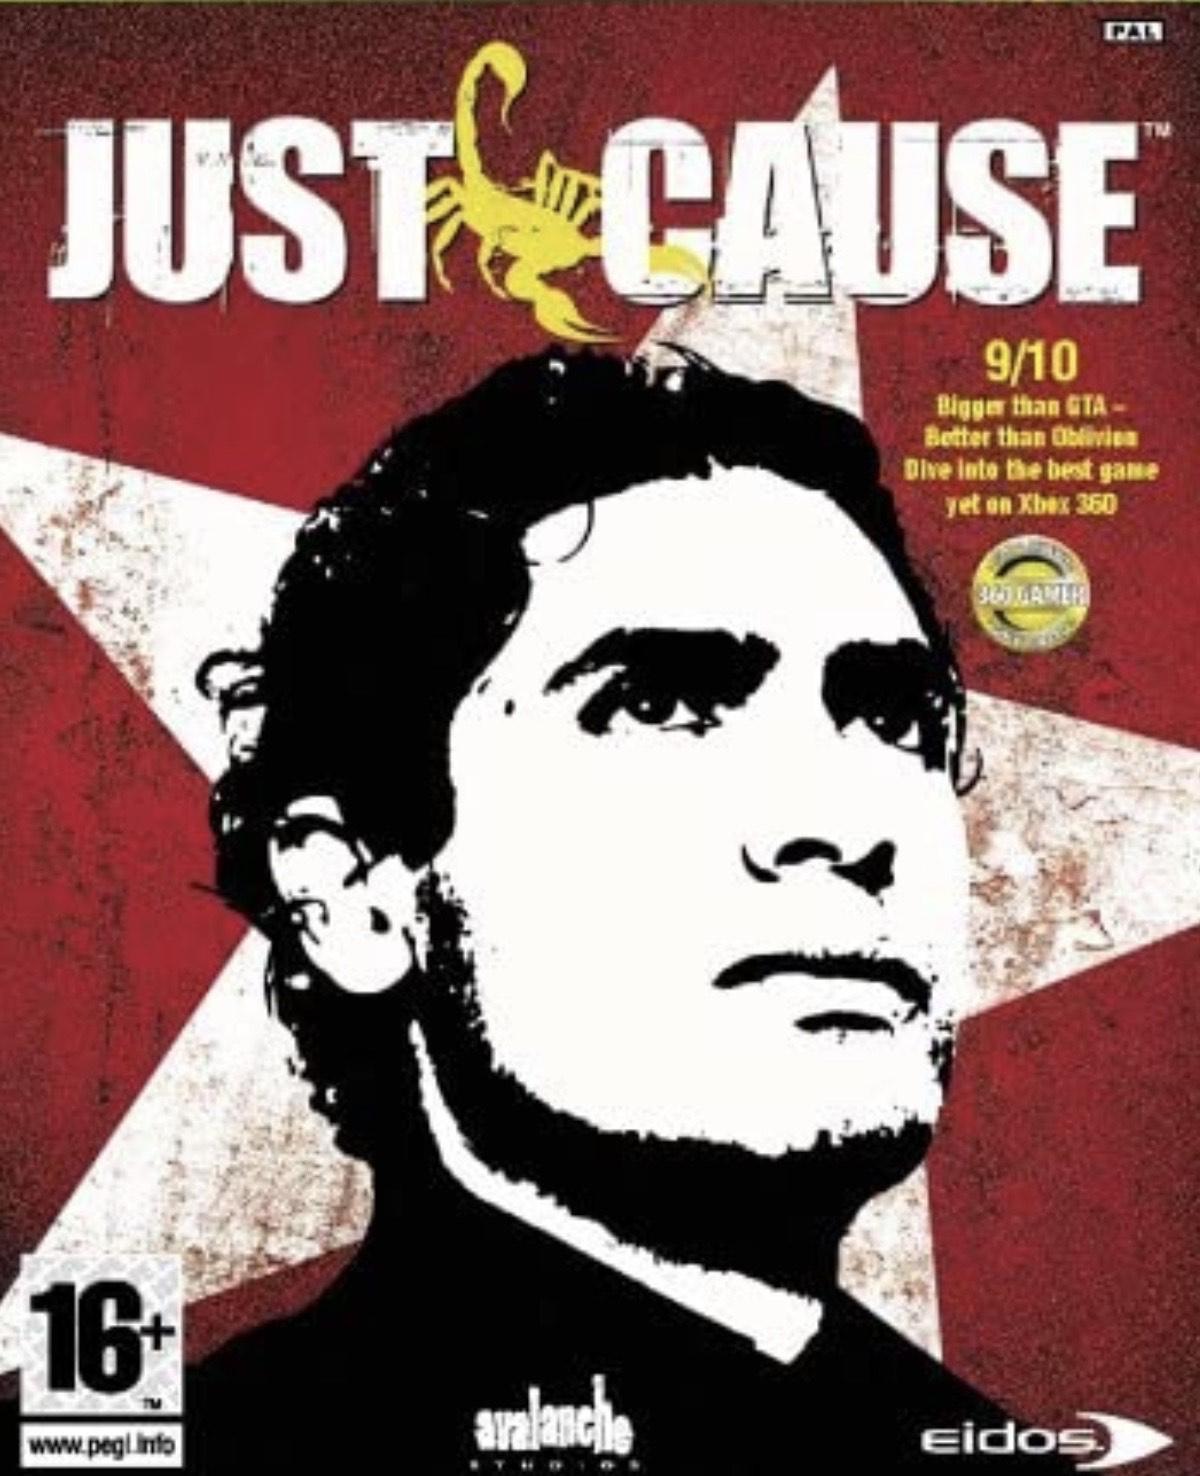 Just cause 0.89p/ Just cause 2 £1.19 / Just cause 3 £3.99 (Xbox one/Xbox 360) @ Microsoft store